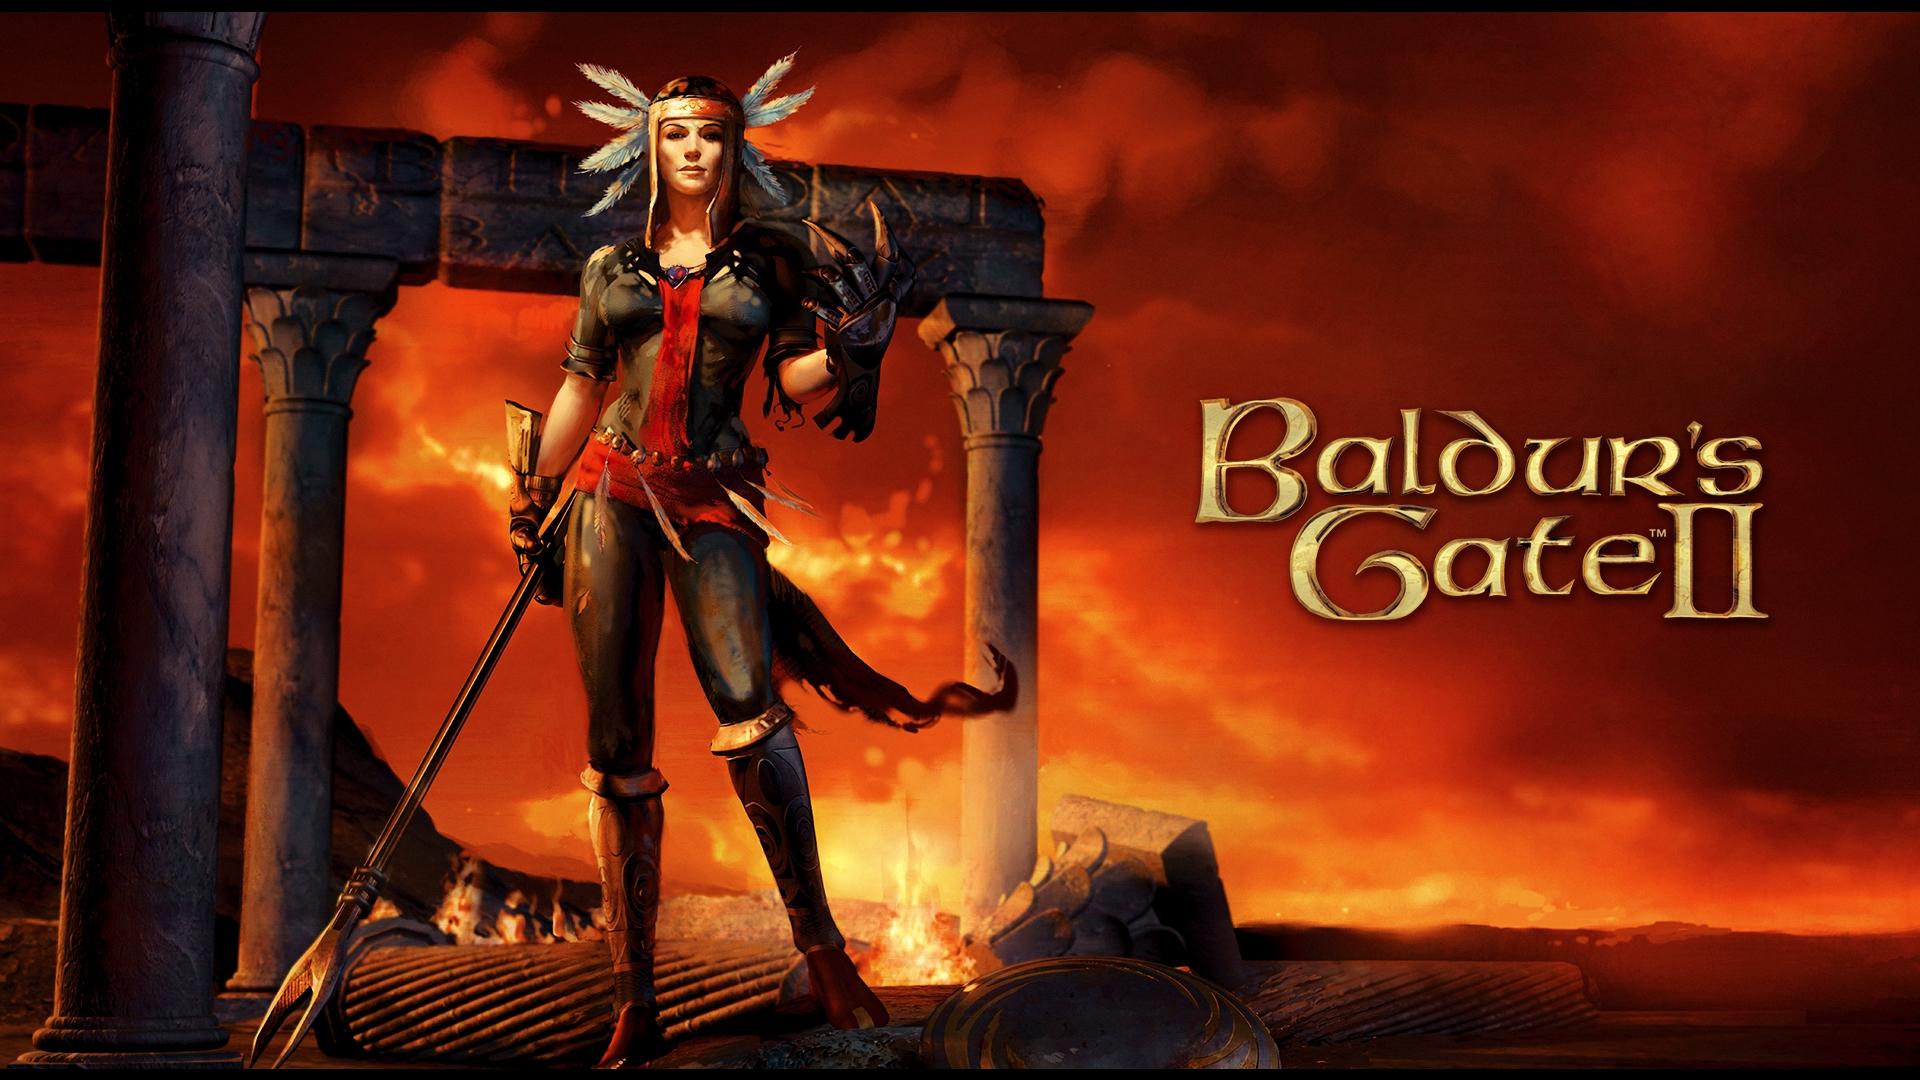 Baldurs Gate Ii Fondo De Pantalla Hd Fondo De Escritorio